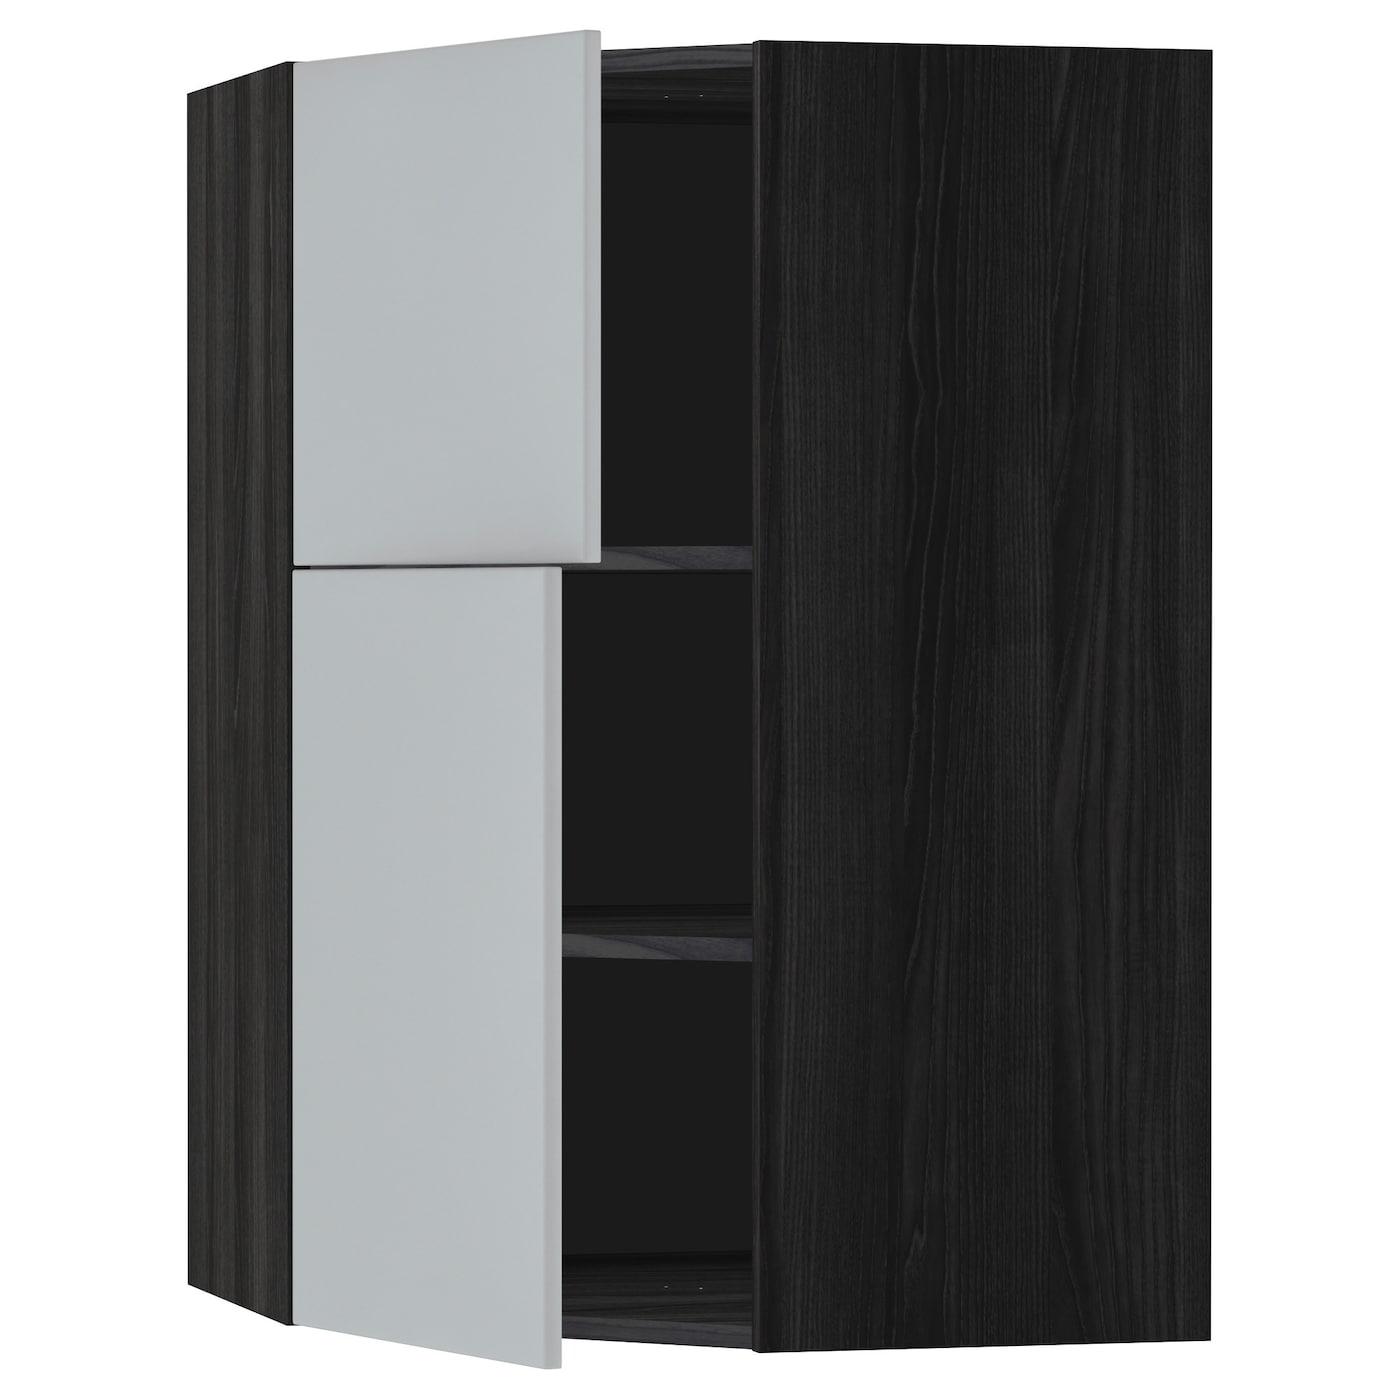 Metod Corner Wall Cab W Shelves 2 Doors Black Veddinge